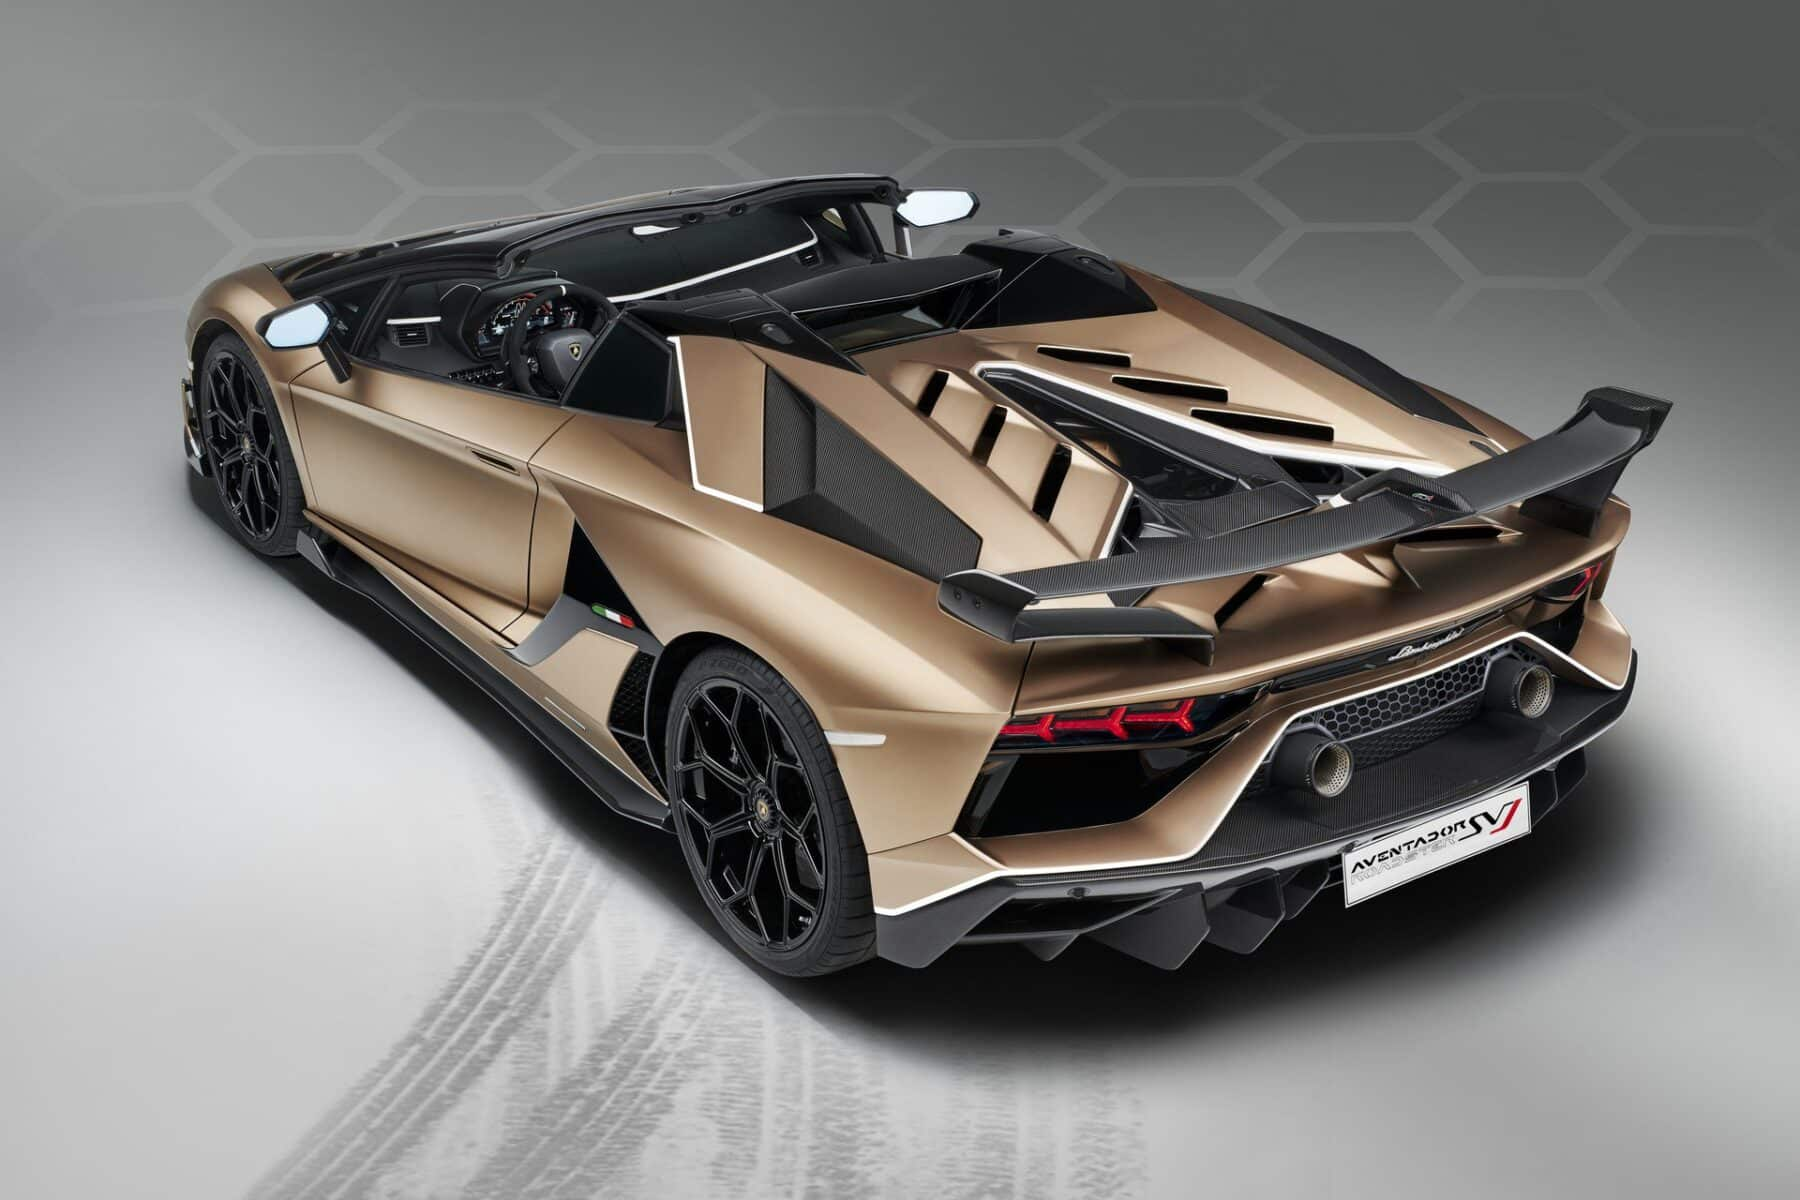 Lamborghini Aventador Svj Roadster 770 Cv A Cielo Abierto